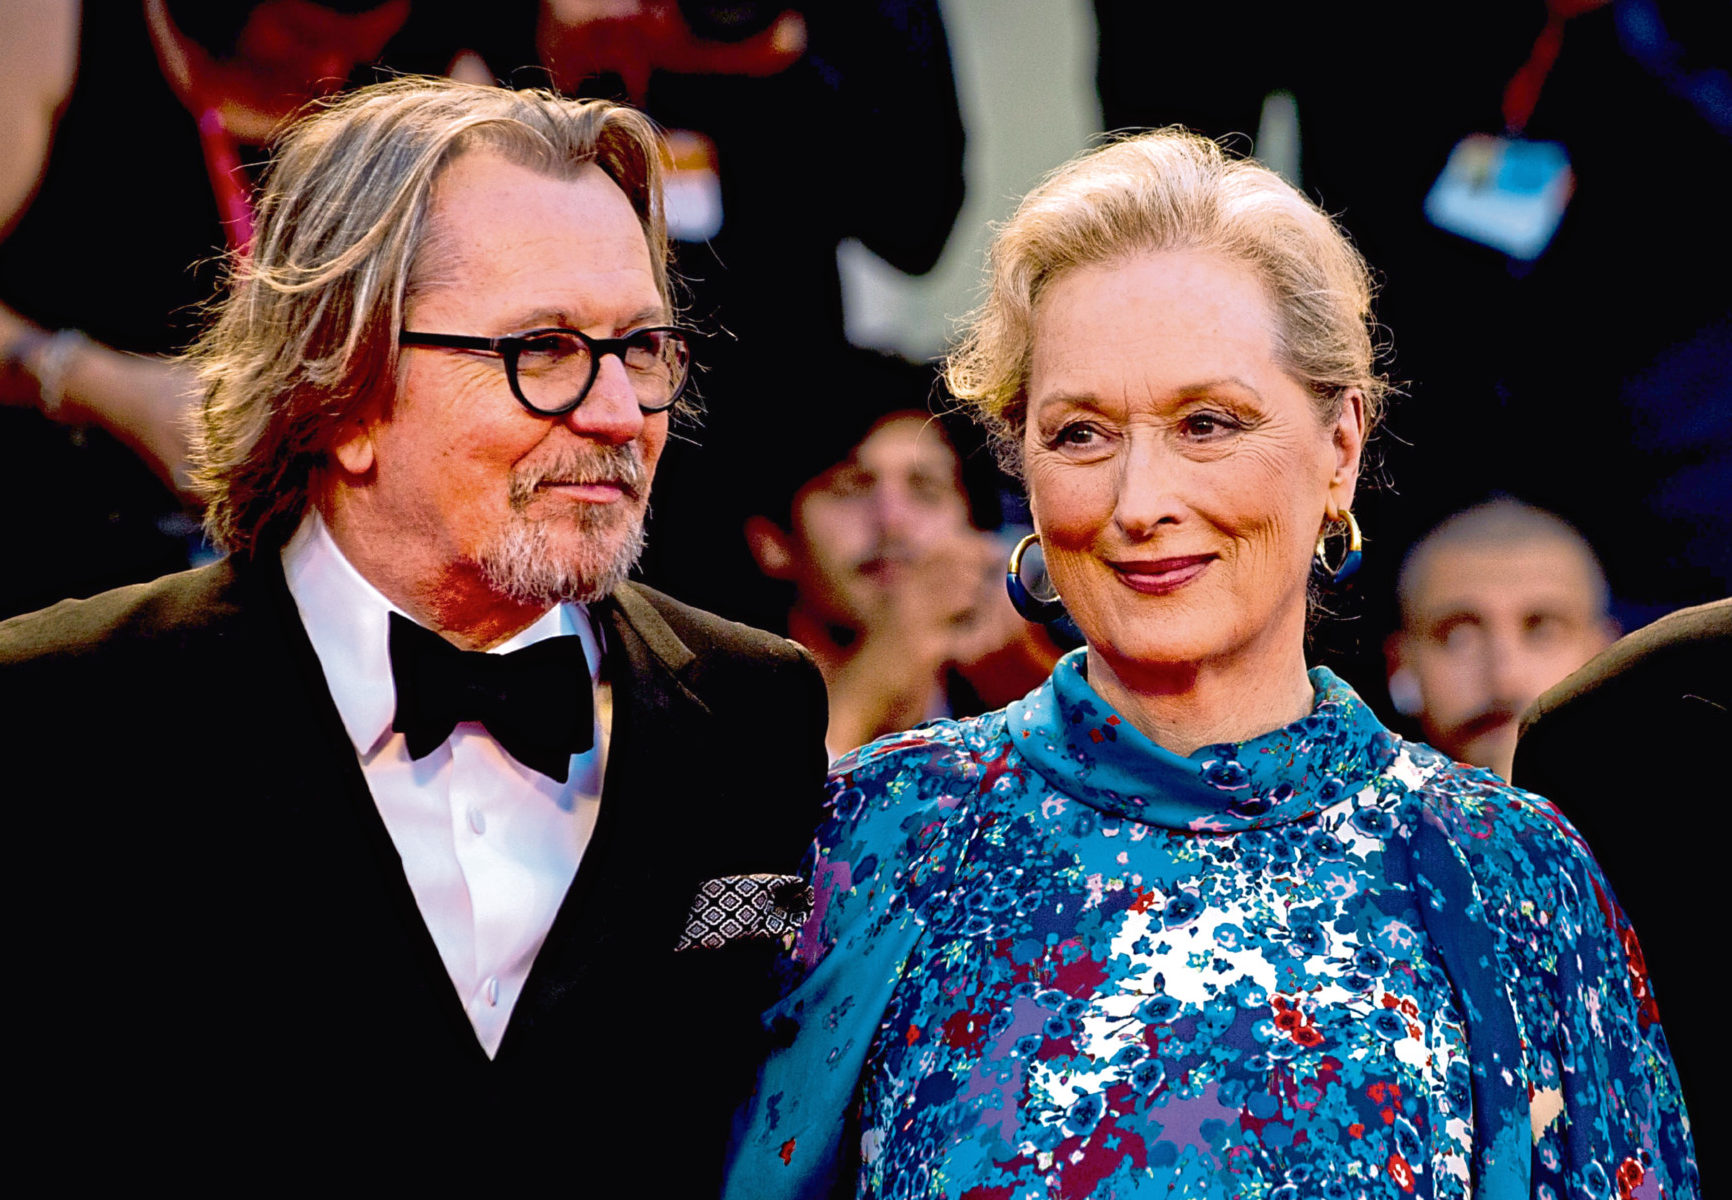 Meryl Streep with co-star Gary Oldman on the red carpet